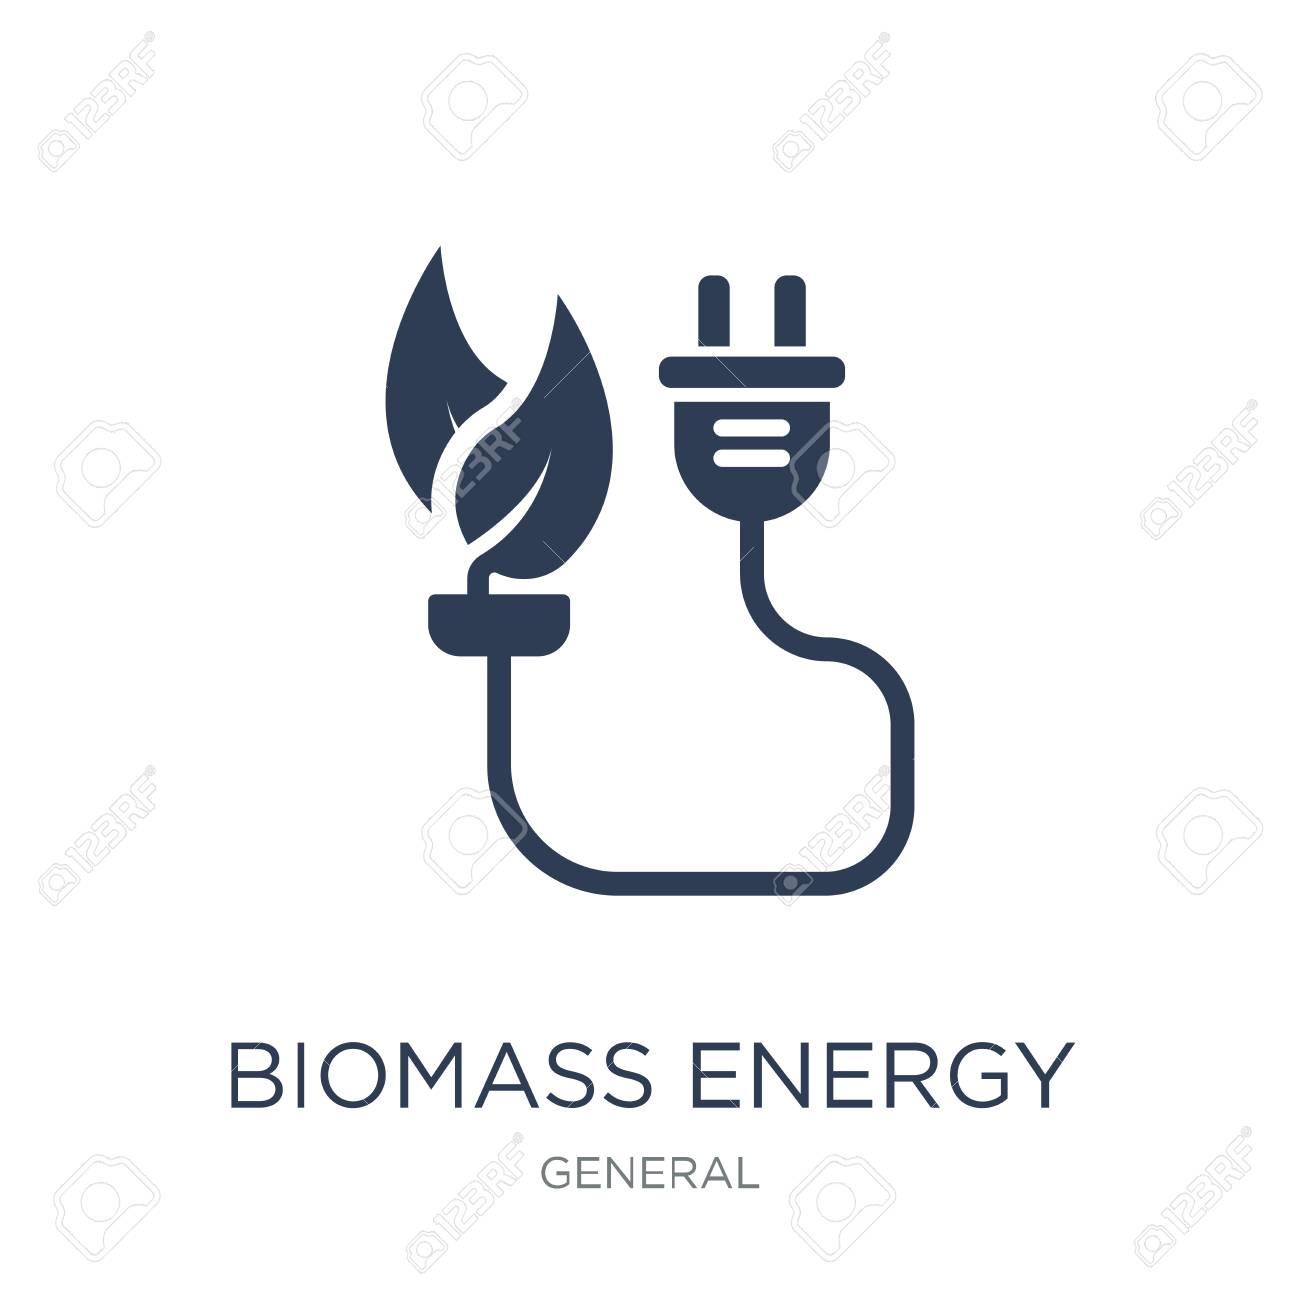 biomass energy icon  Trendy flat vector biomass energy icon on